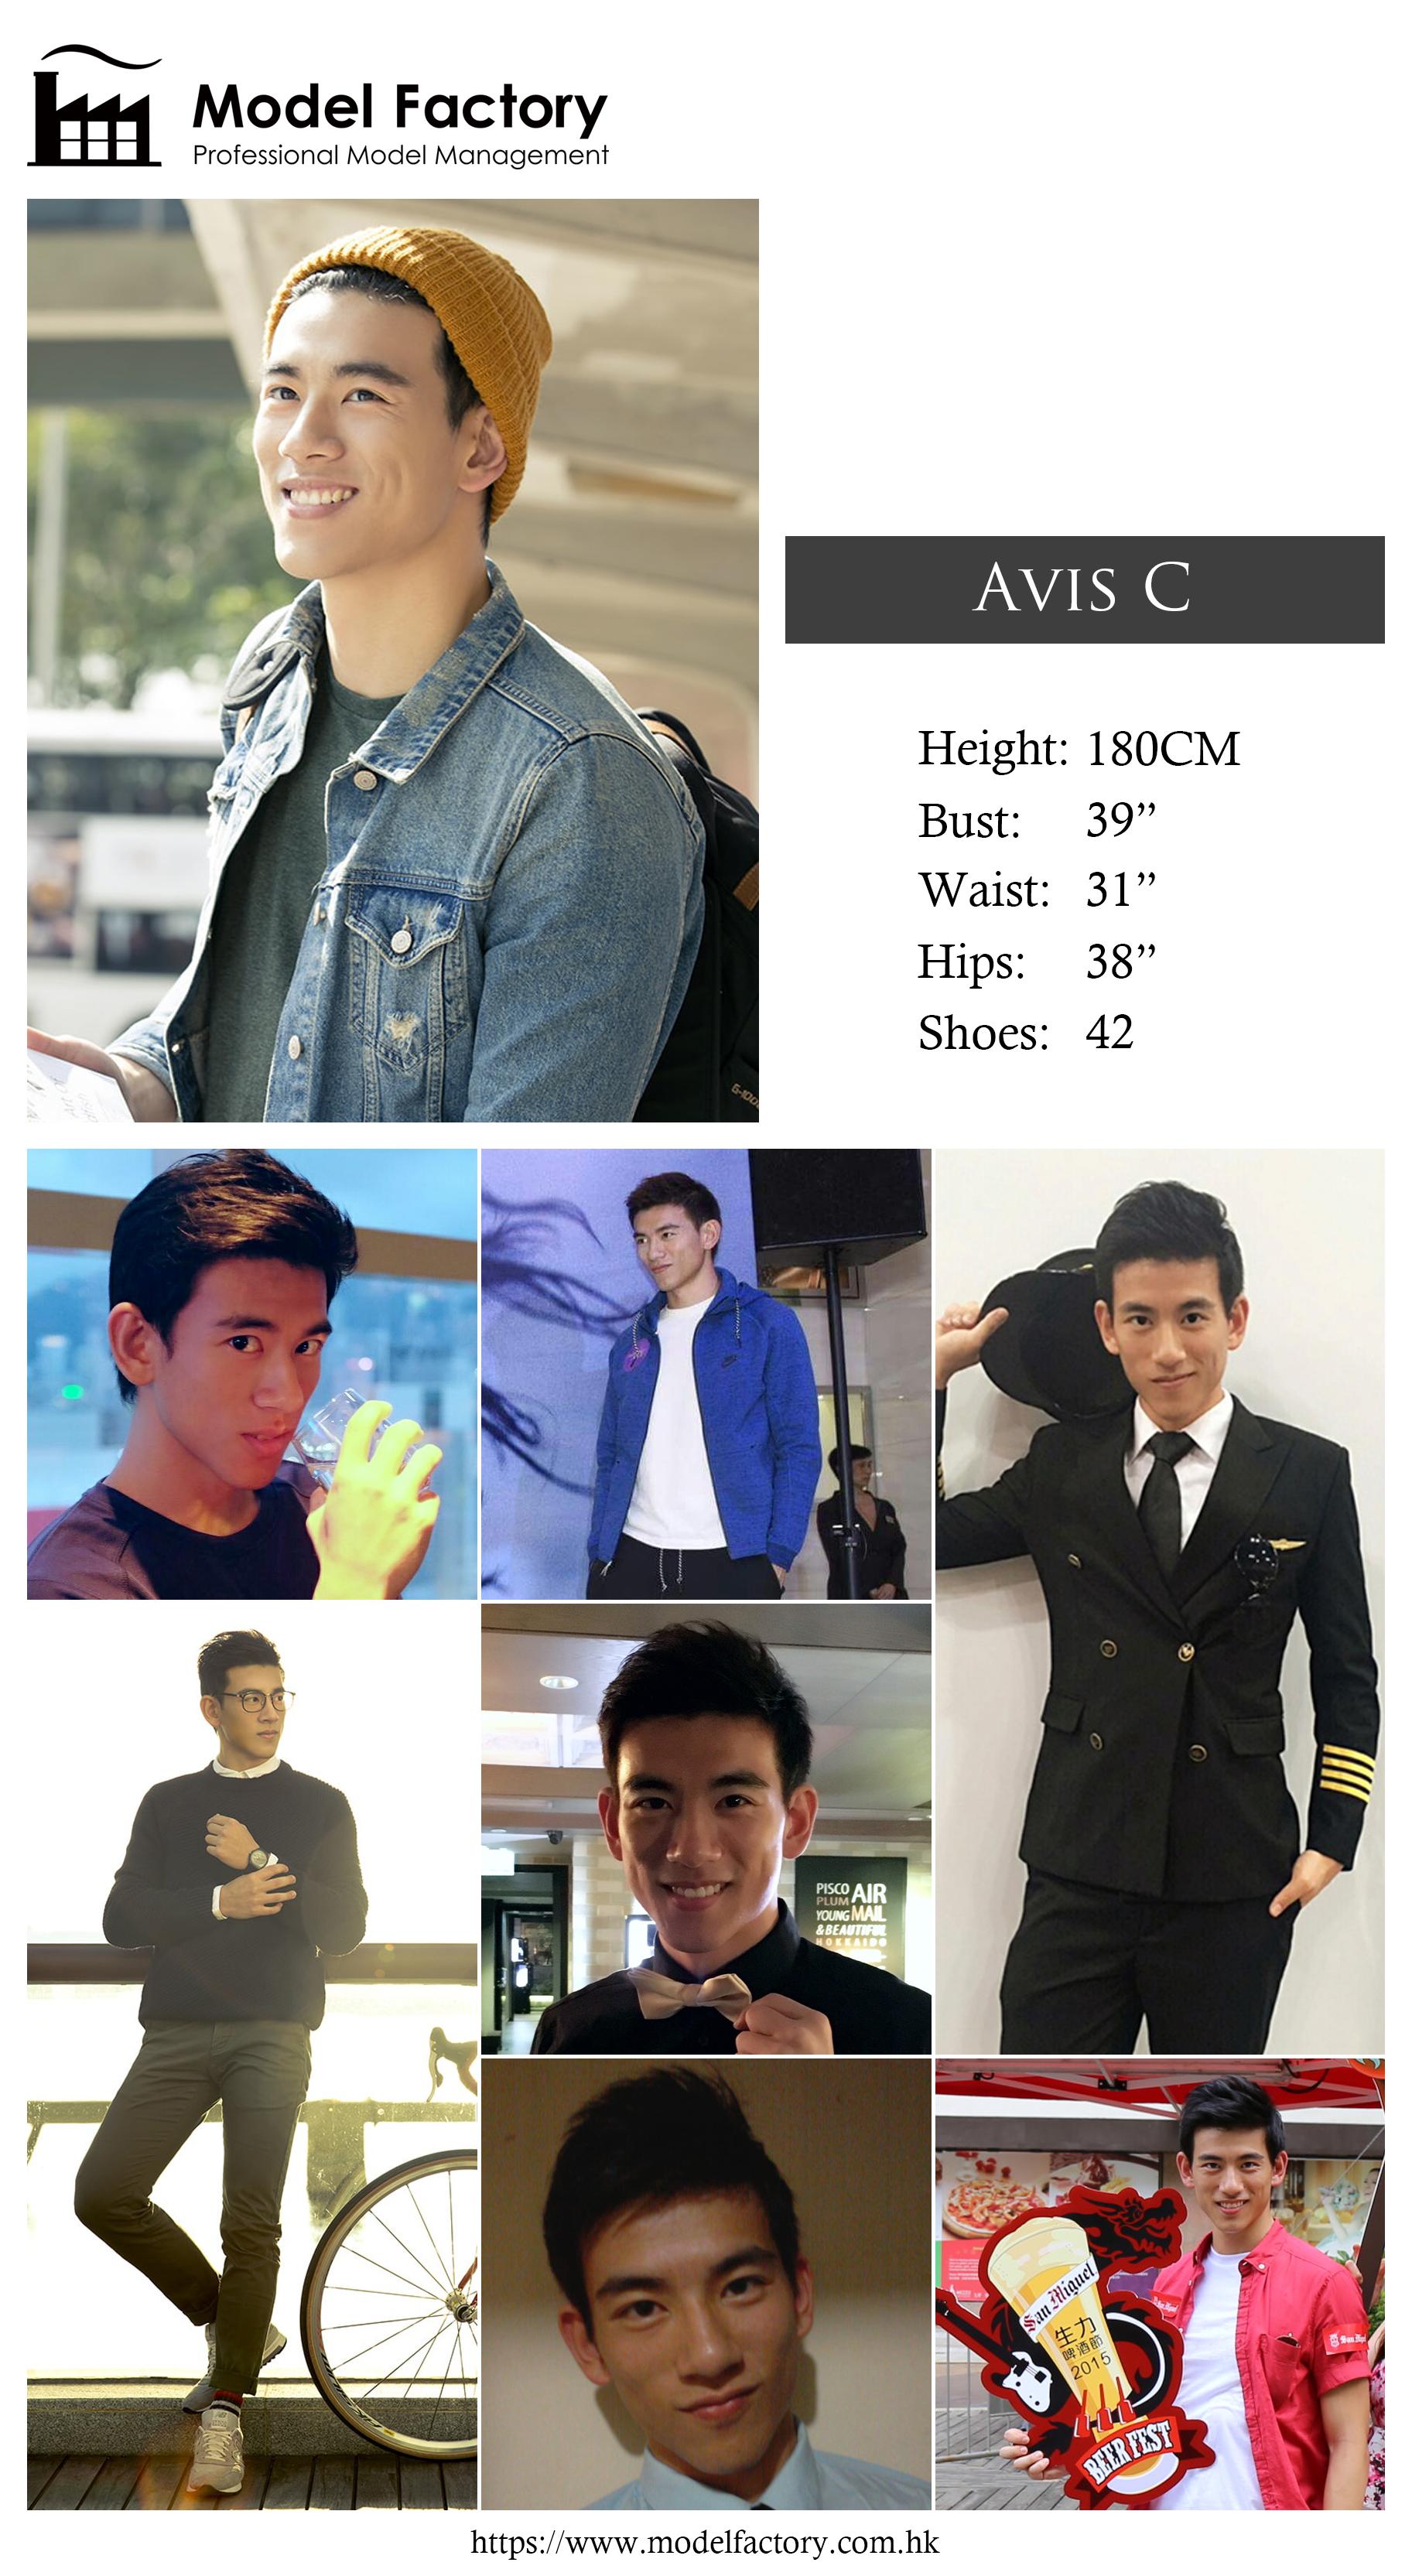 Model Factory Hong Kong Male Model AvisC